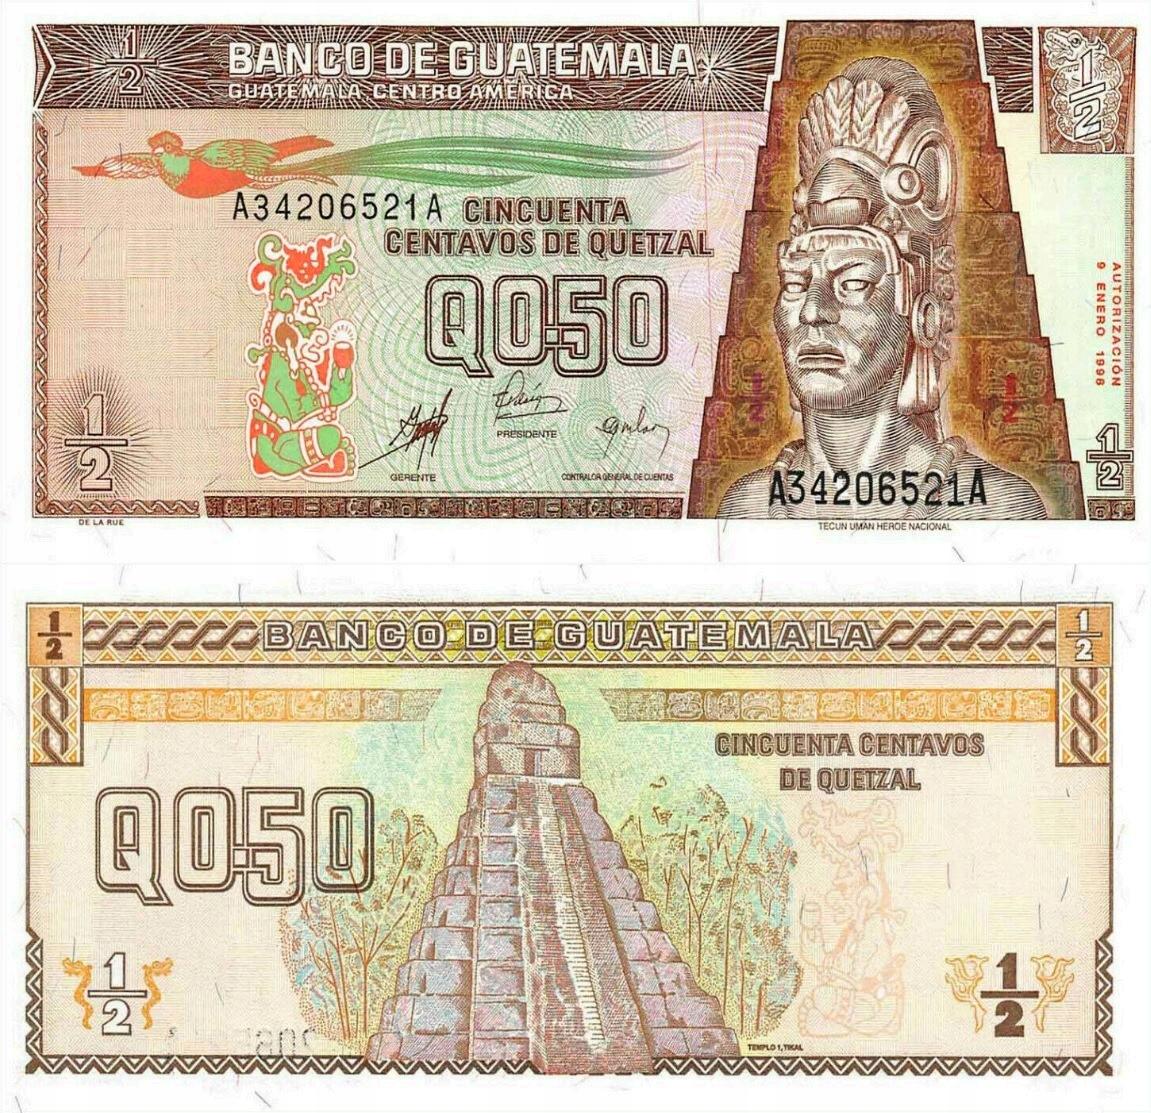 # GWATEMALA - 1/2 QUETZALA - 1998 - P-98 - UNC